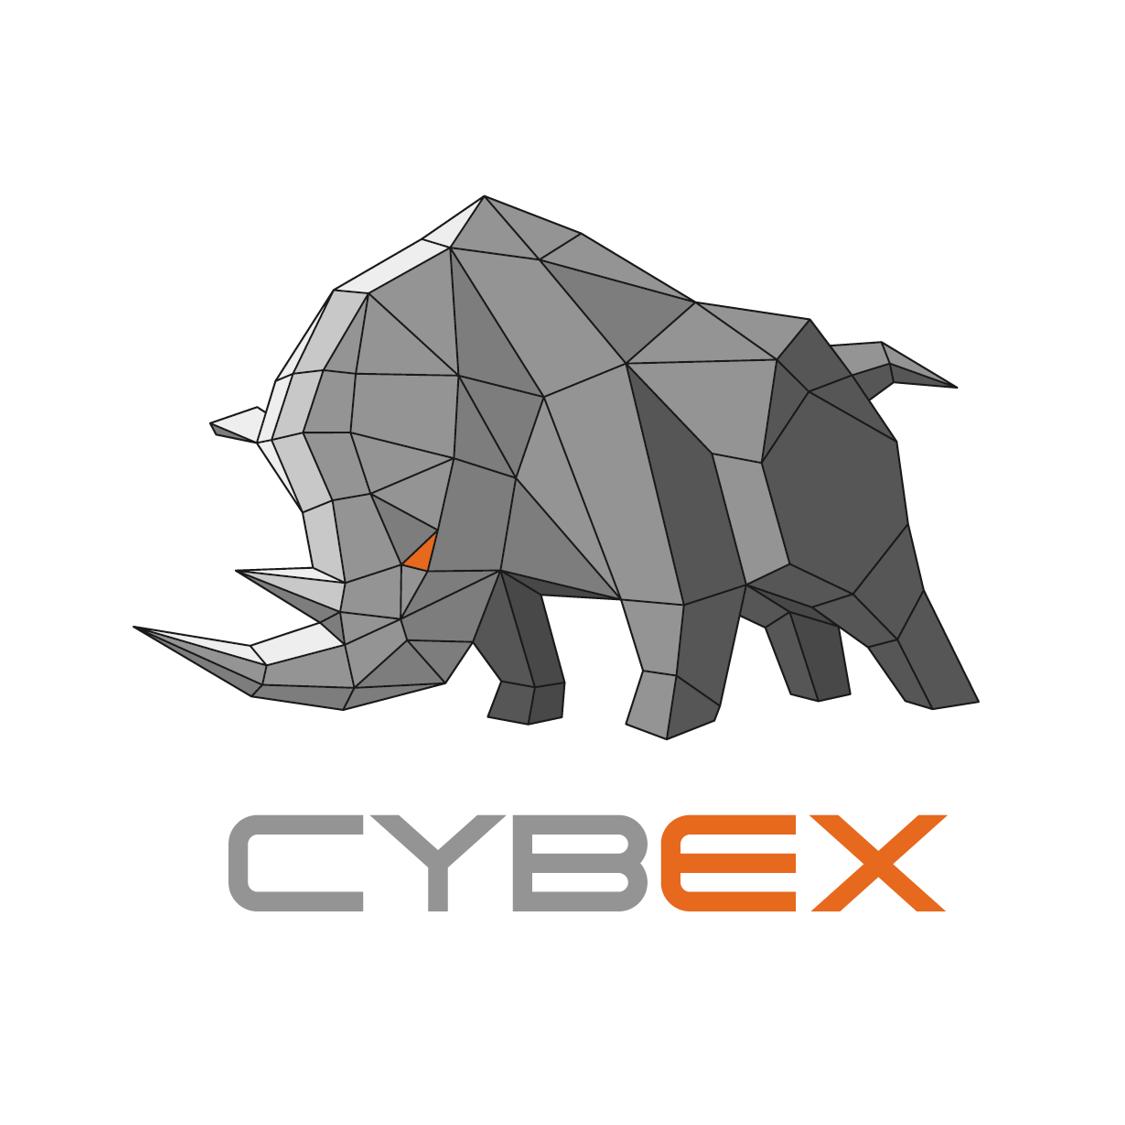 Cybex DEX Logo